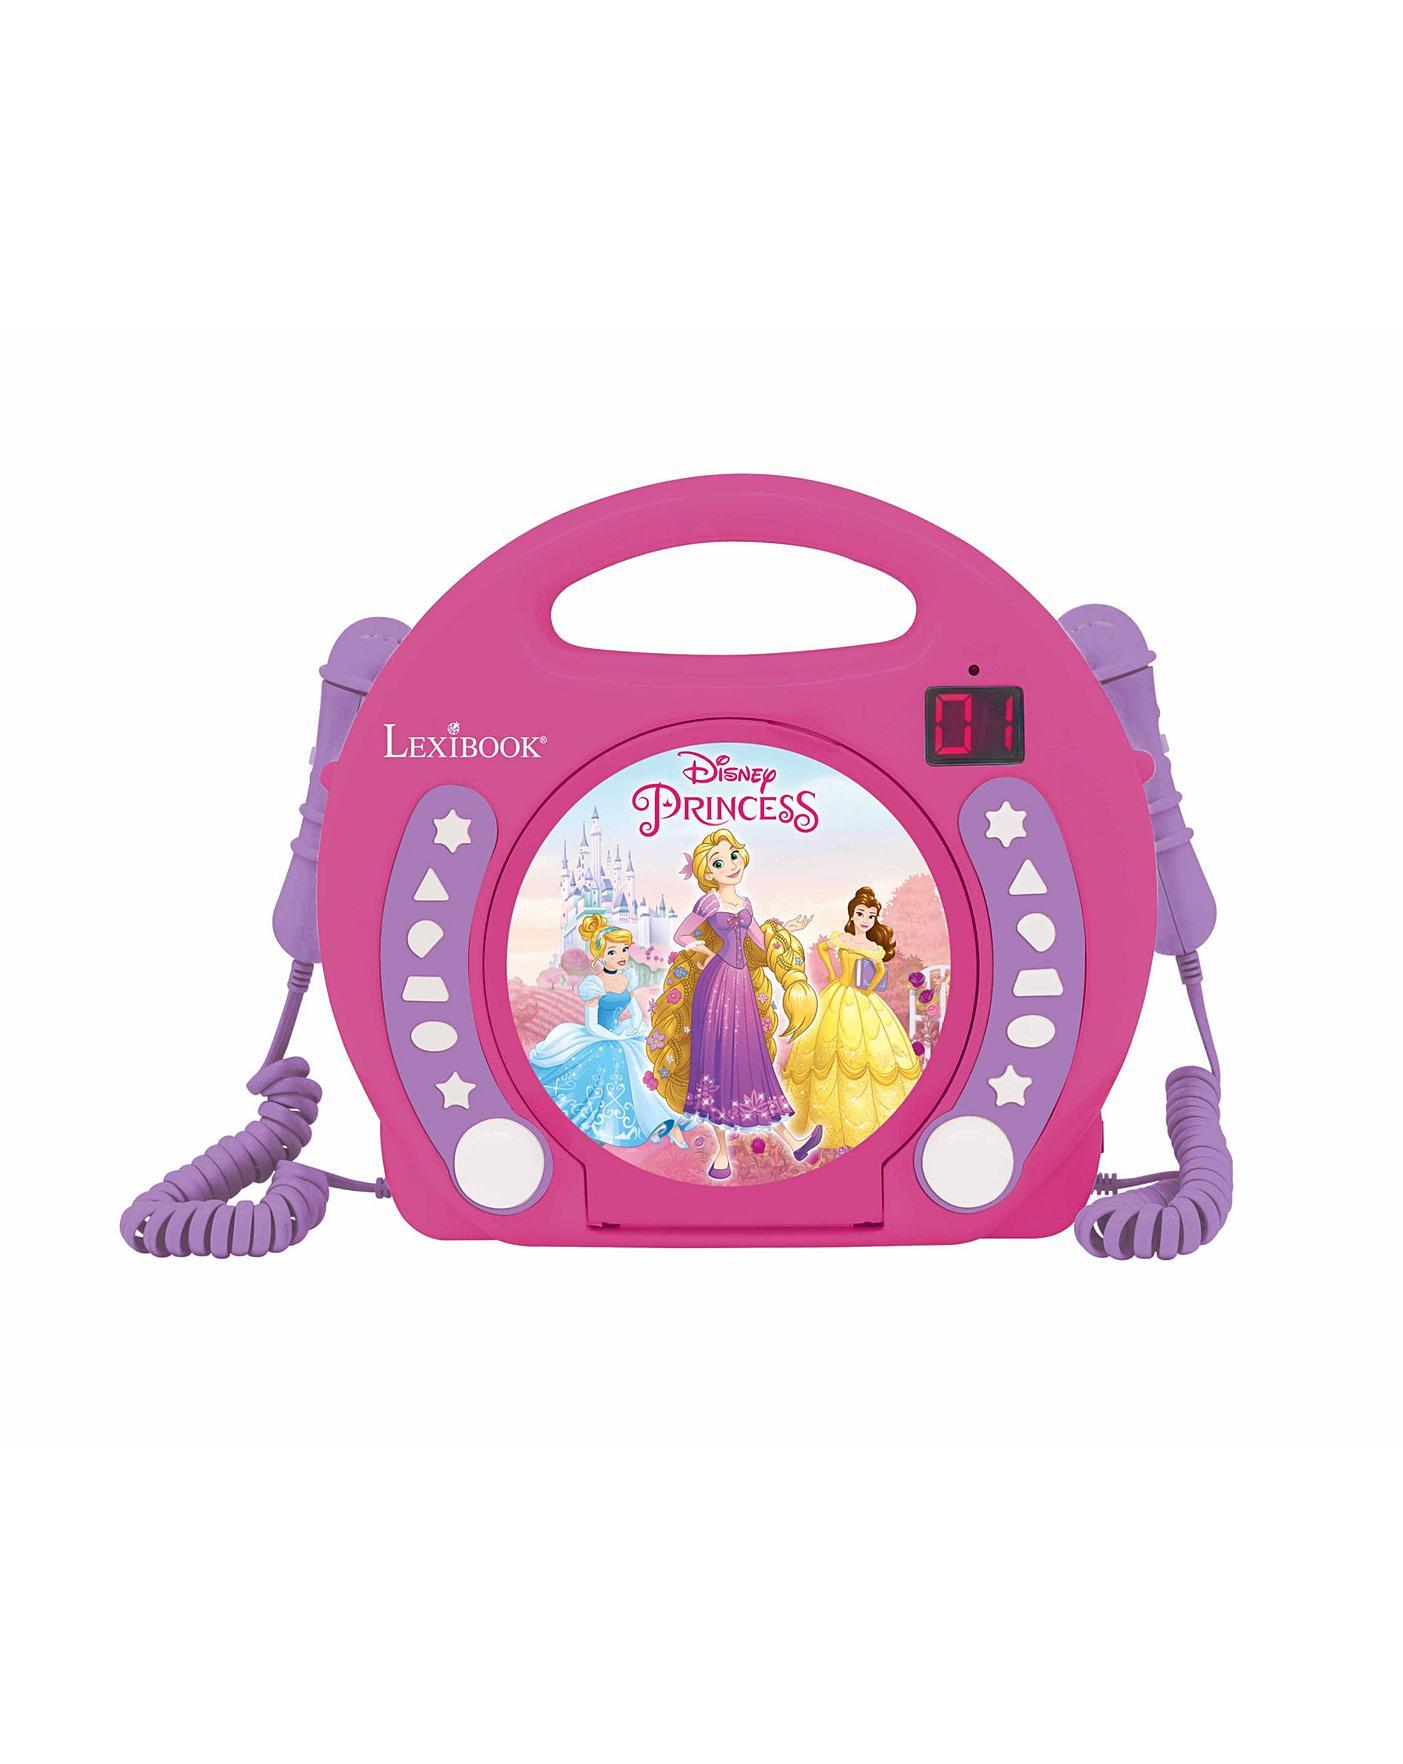 Lexibook Disney Princess CD Player